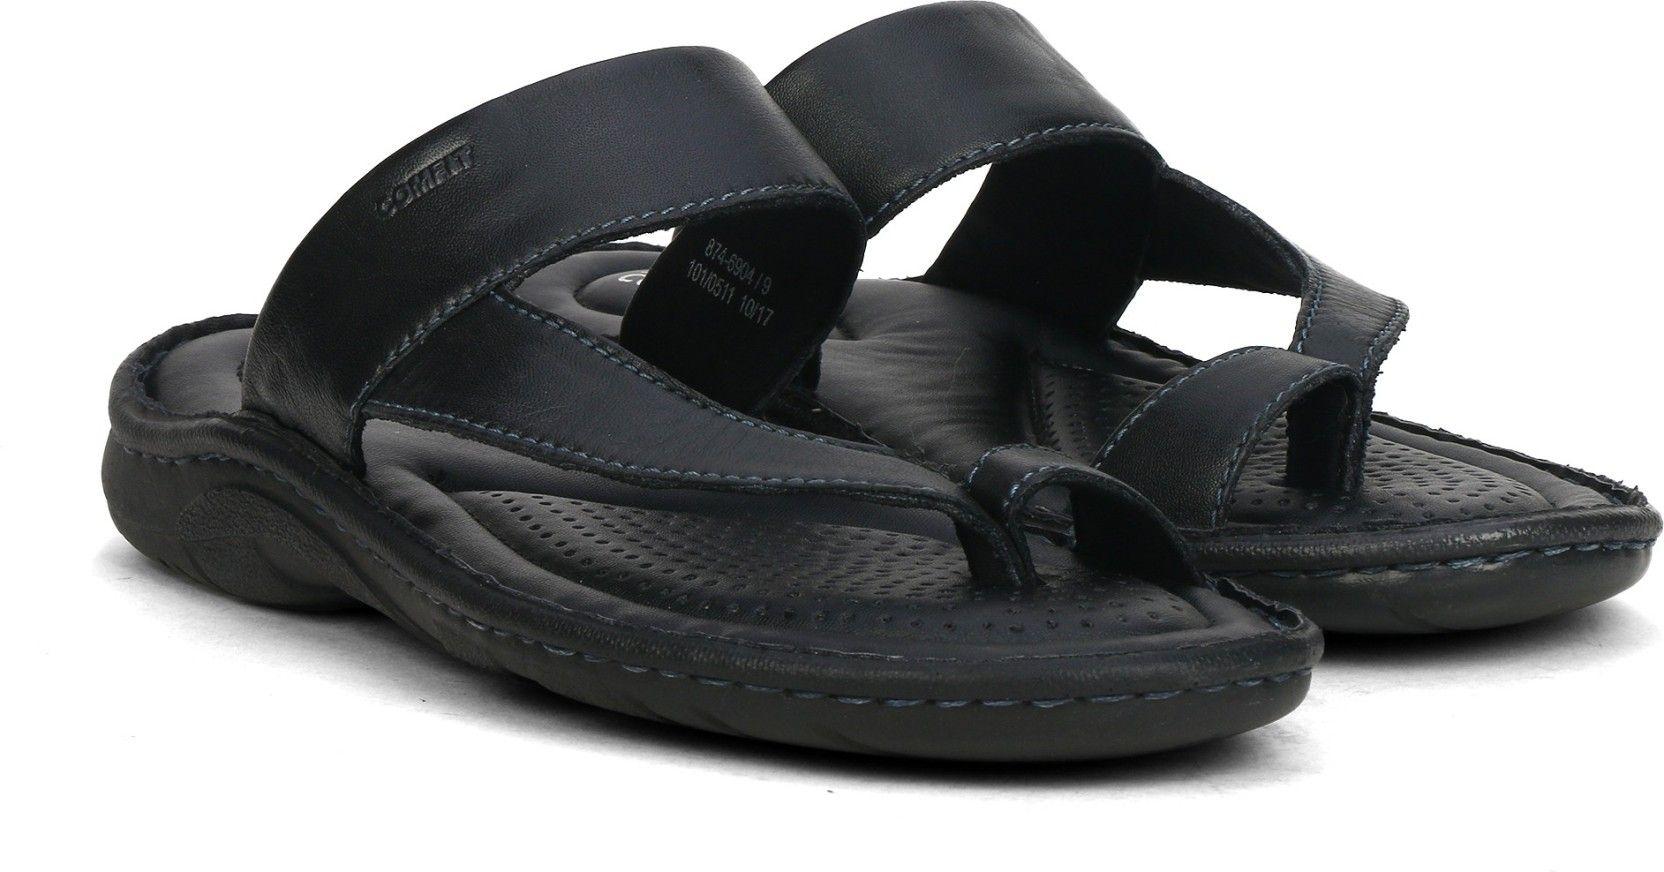 2b276253a336 Bata Men Black Sandals - Buy Black Color Bata Men Black Sandals Online at Best  Price - Shop Online for Footwears in India